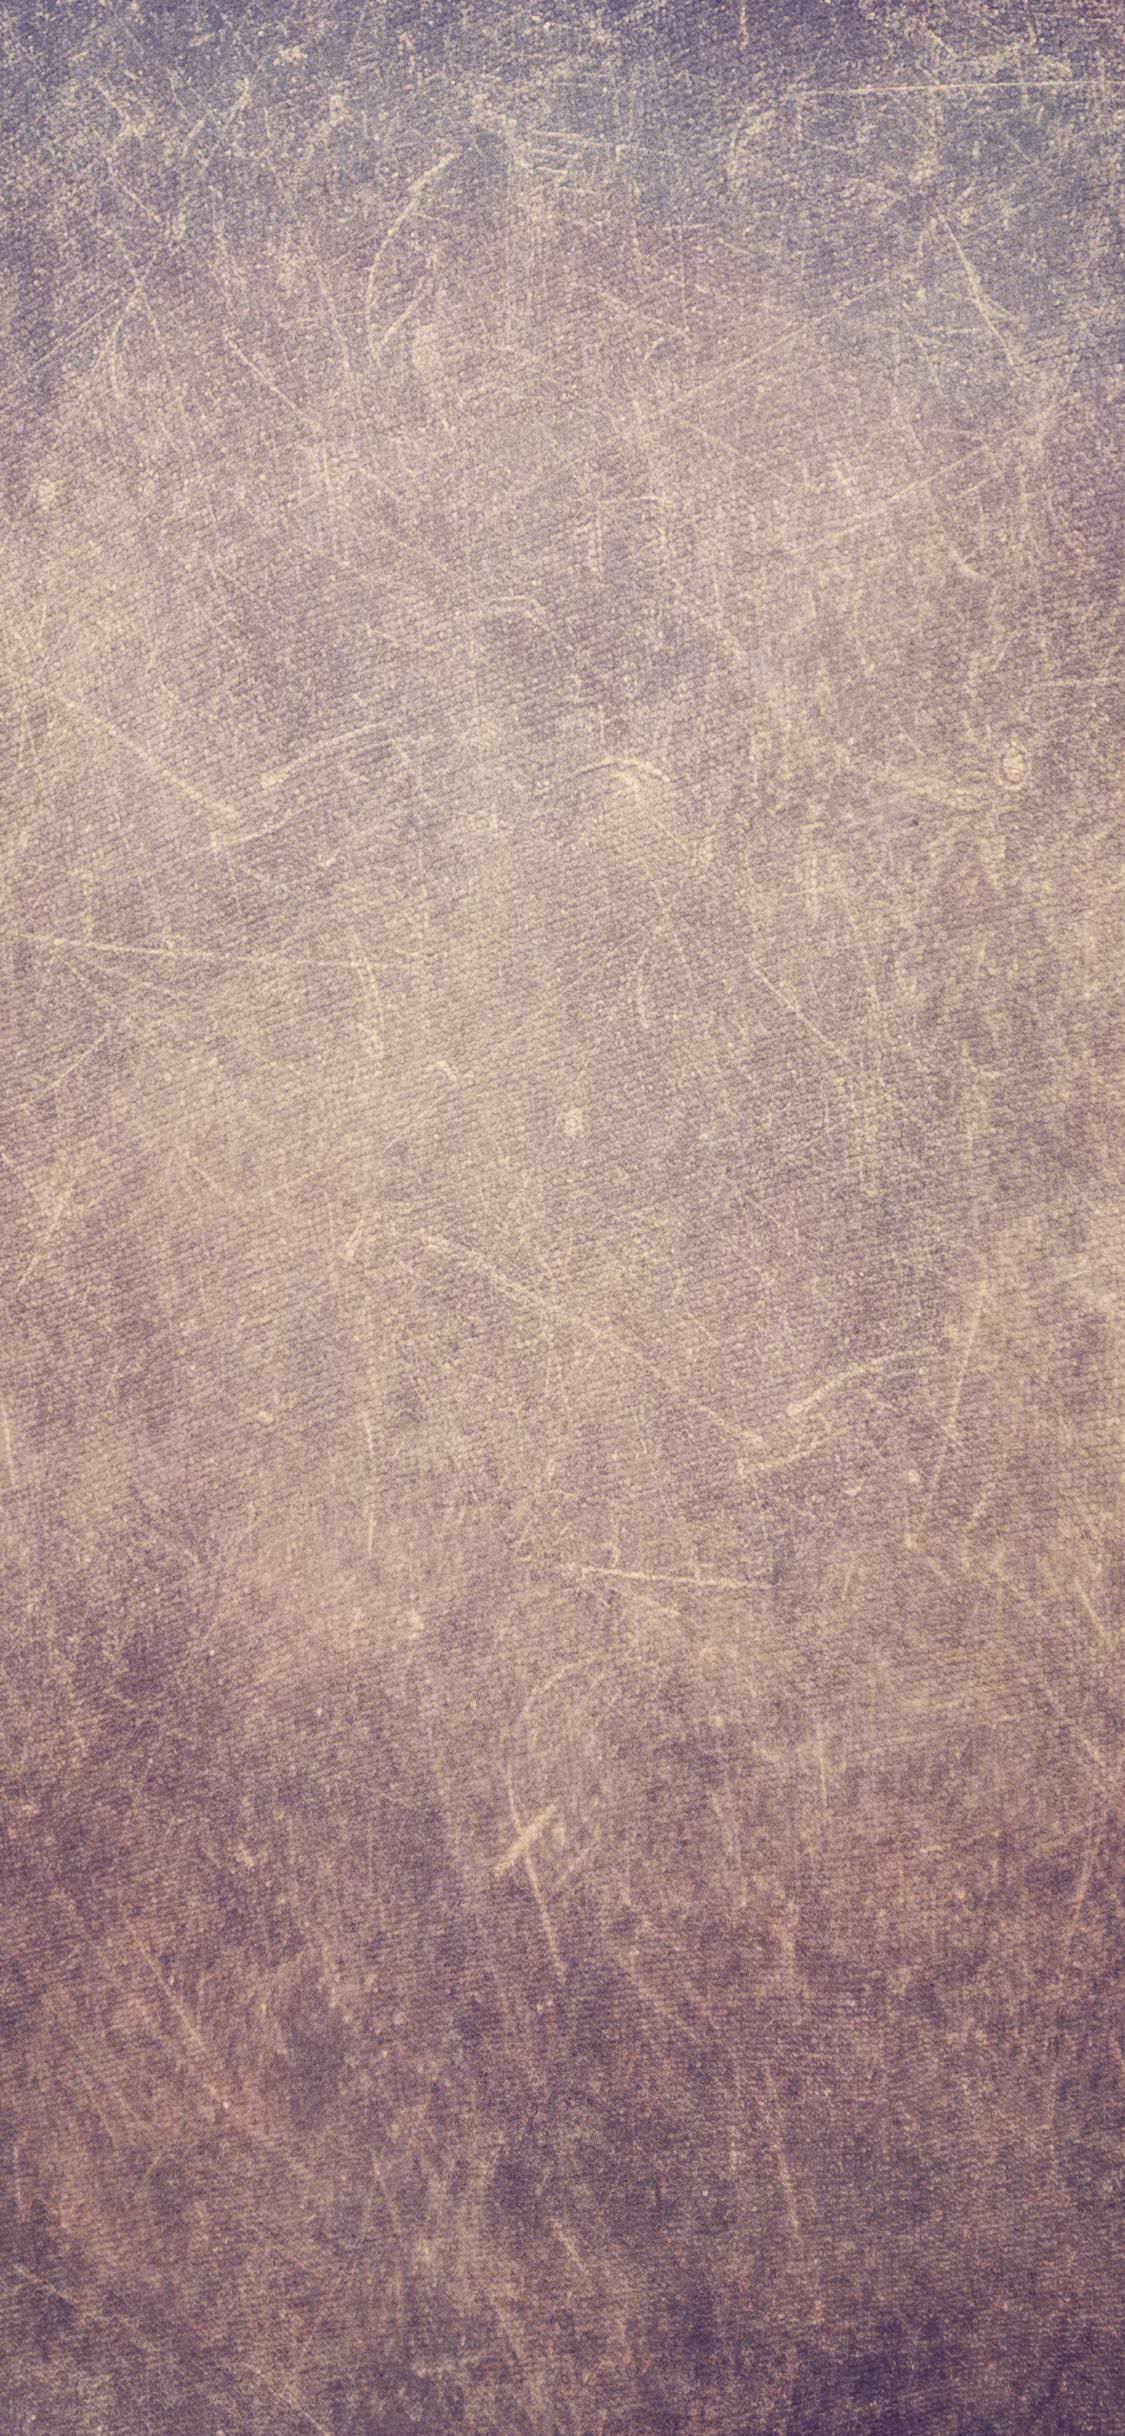 iPhone X 壁紙 wallpaper 0985